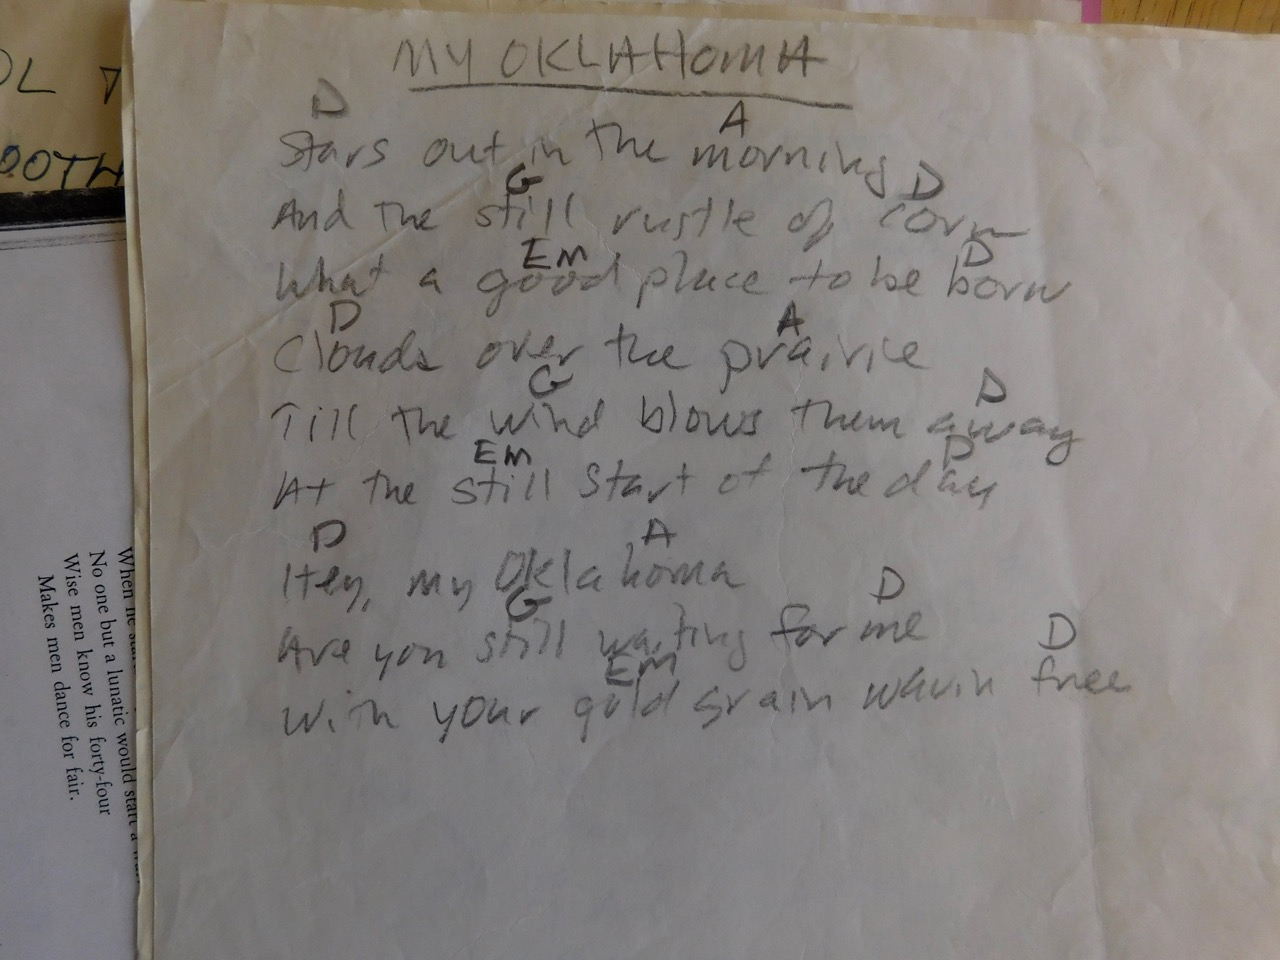 Chords and lyrics my oklahoma chords and lyricsg hexwebz Choice Image